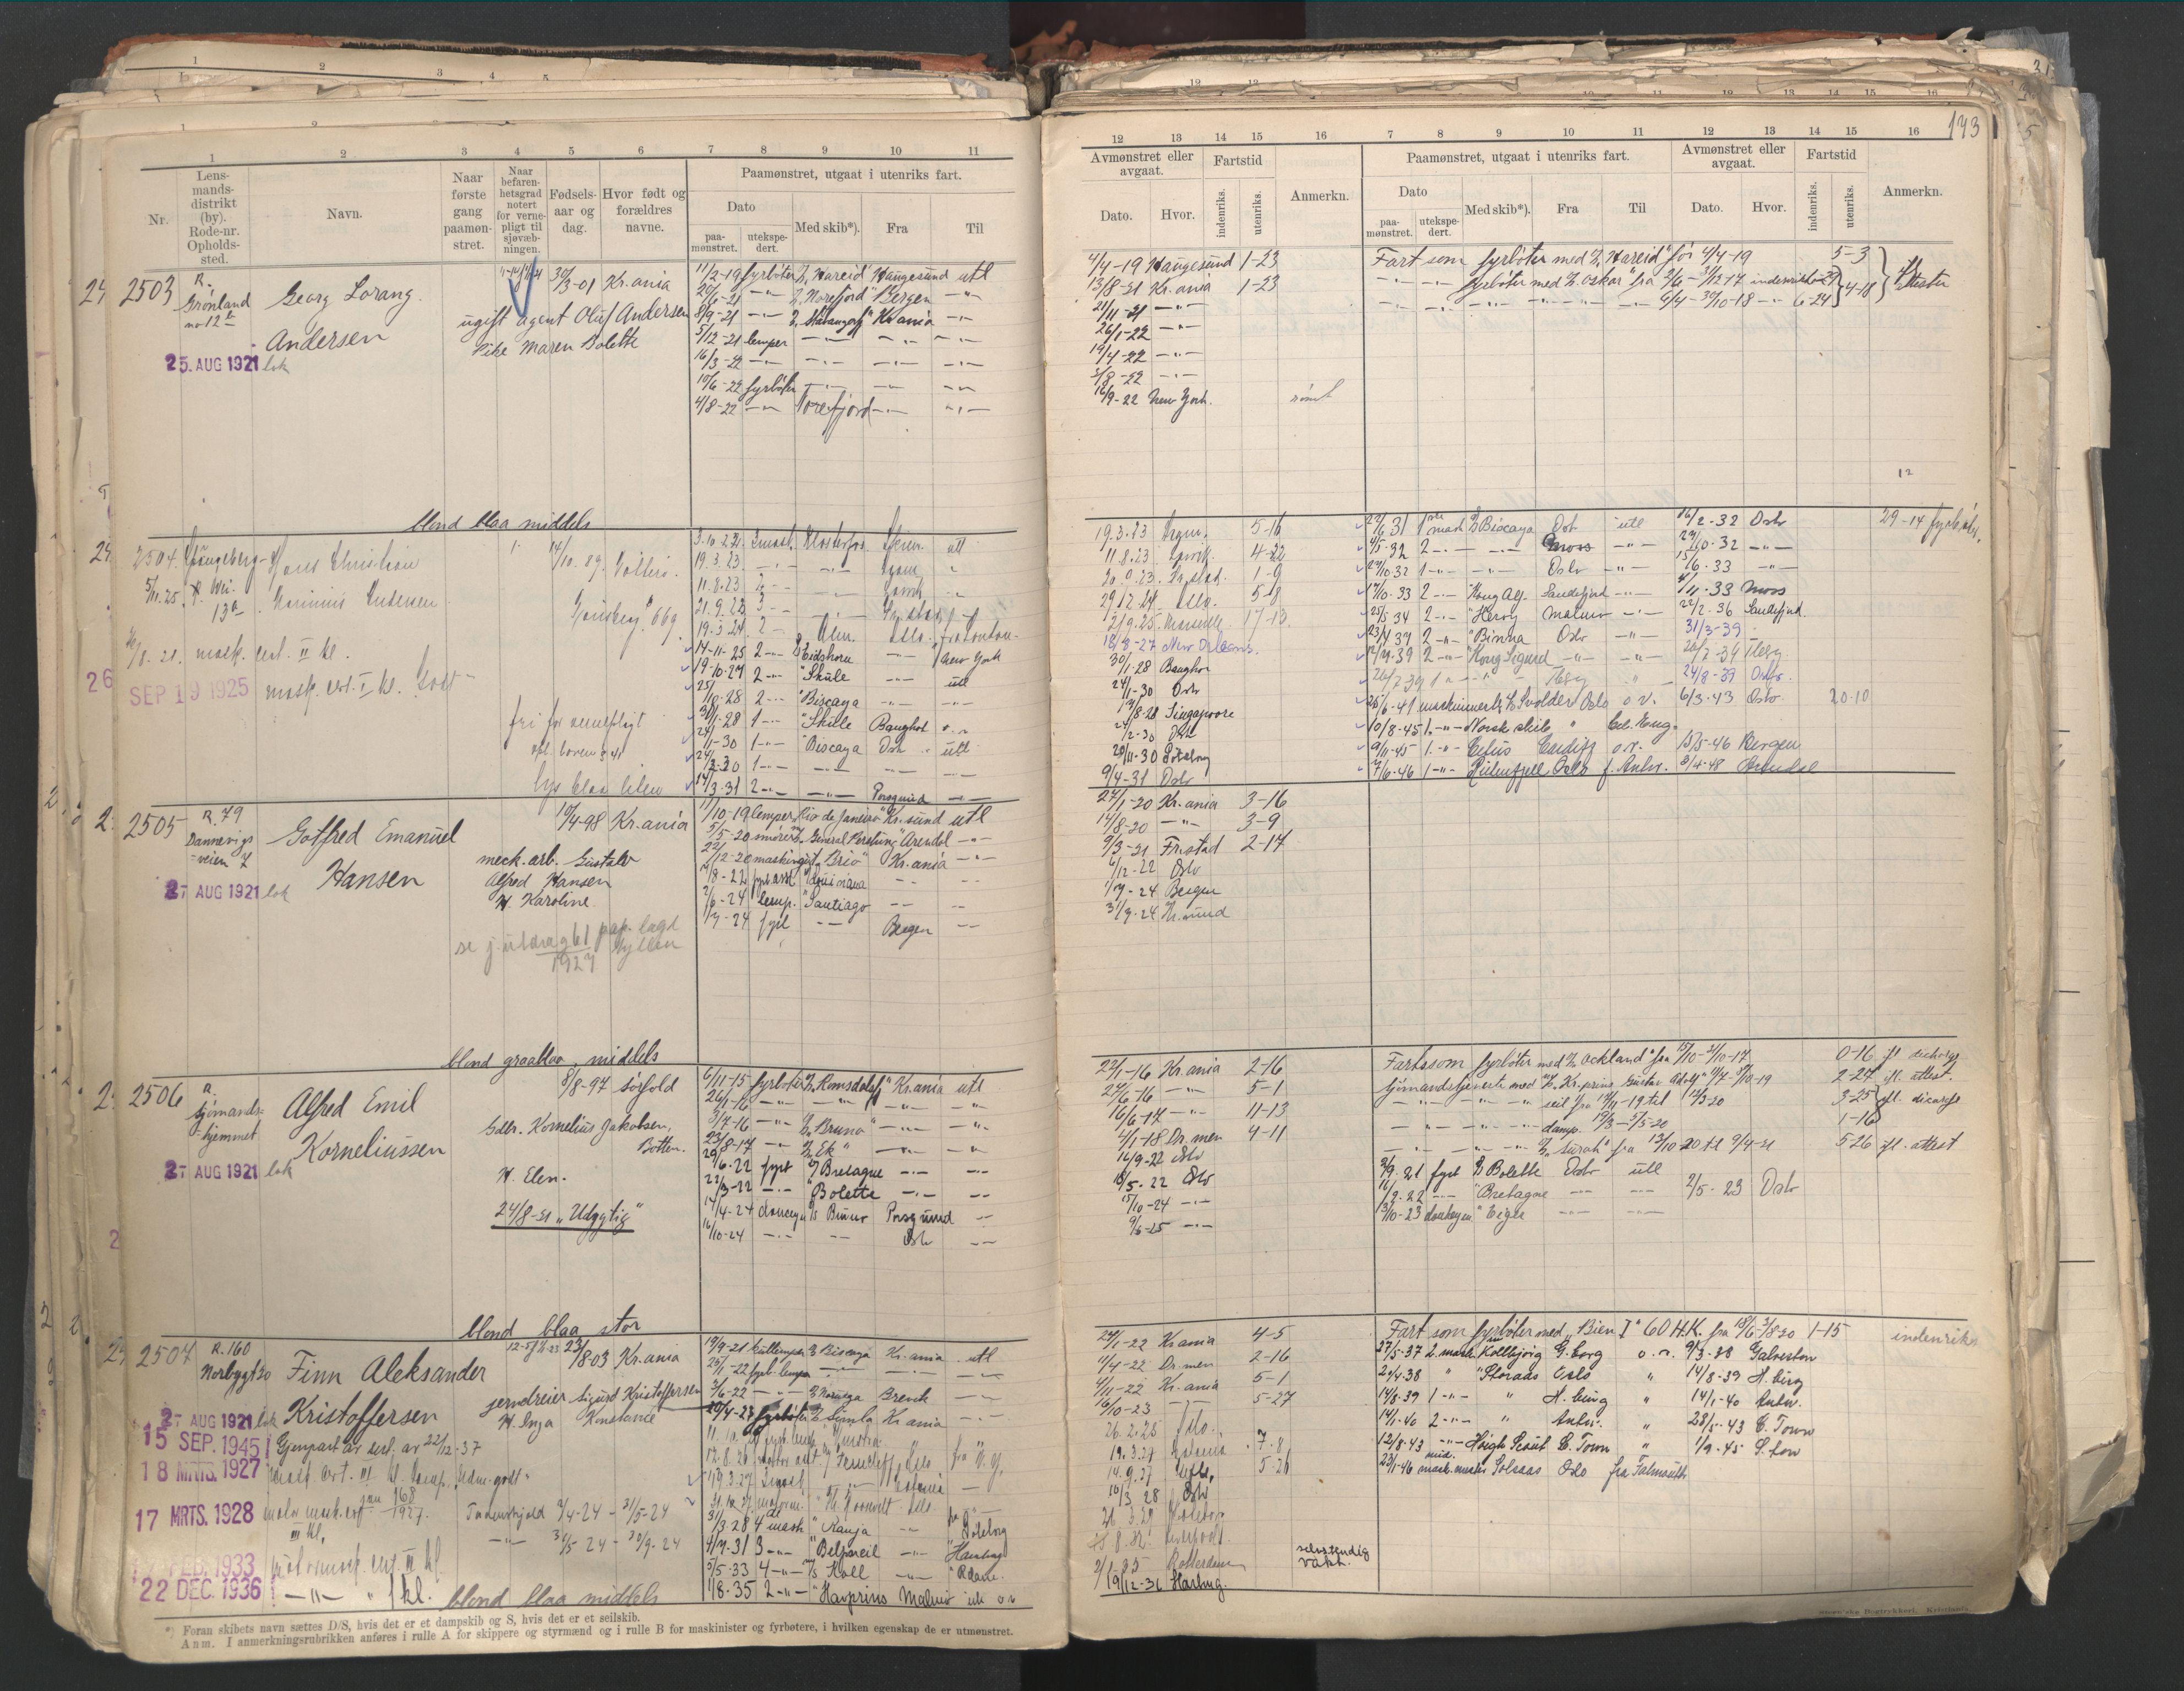 SAO, Oslo sjømannskontor, F/Fd/L0003: B-rulle, 1916, s. 172b-173a